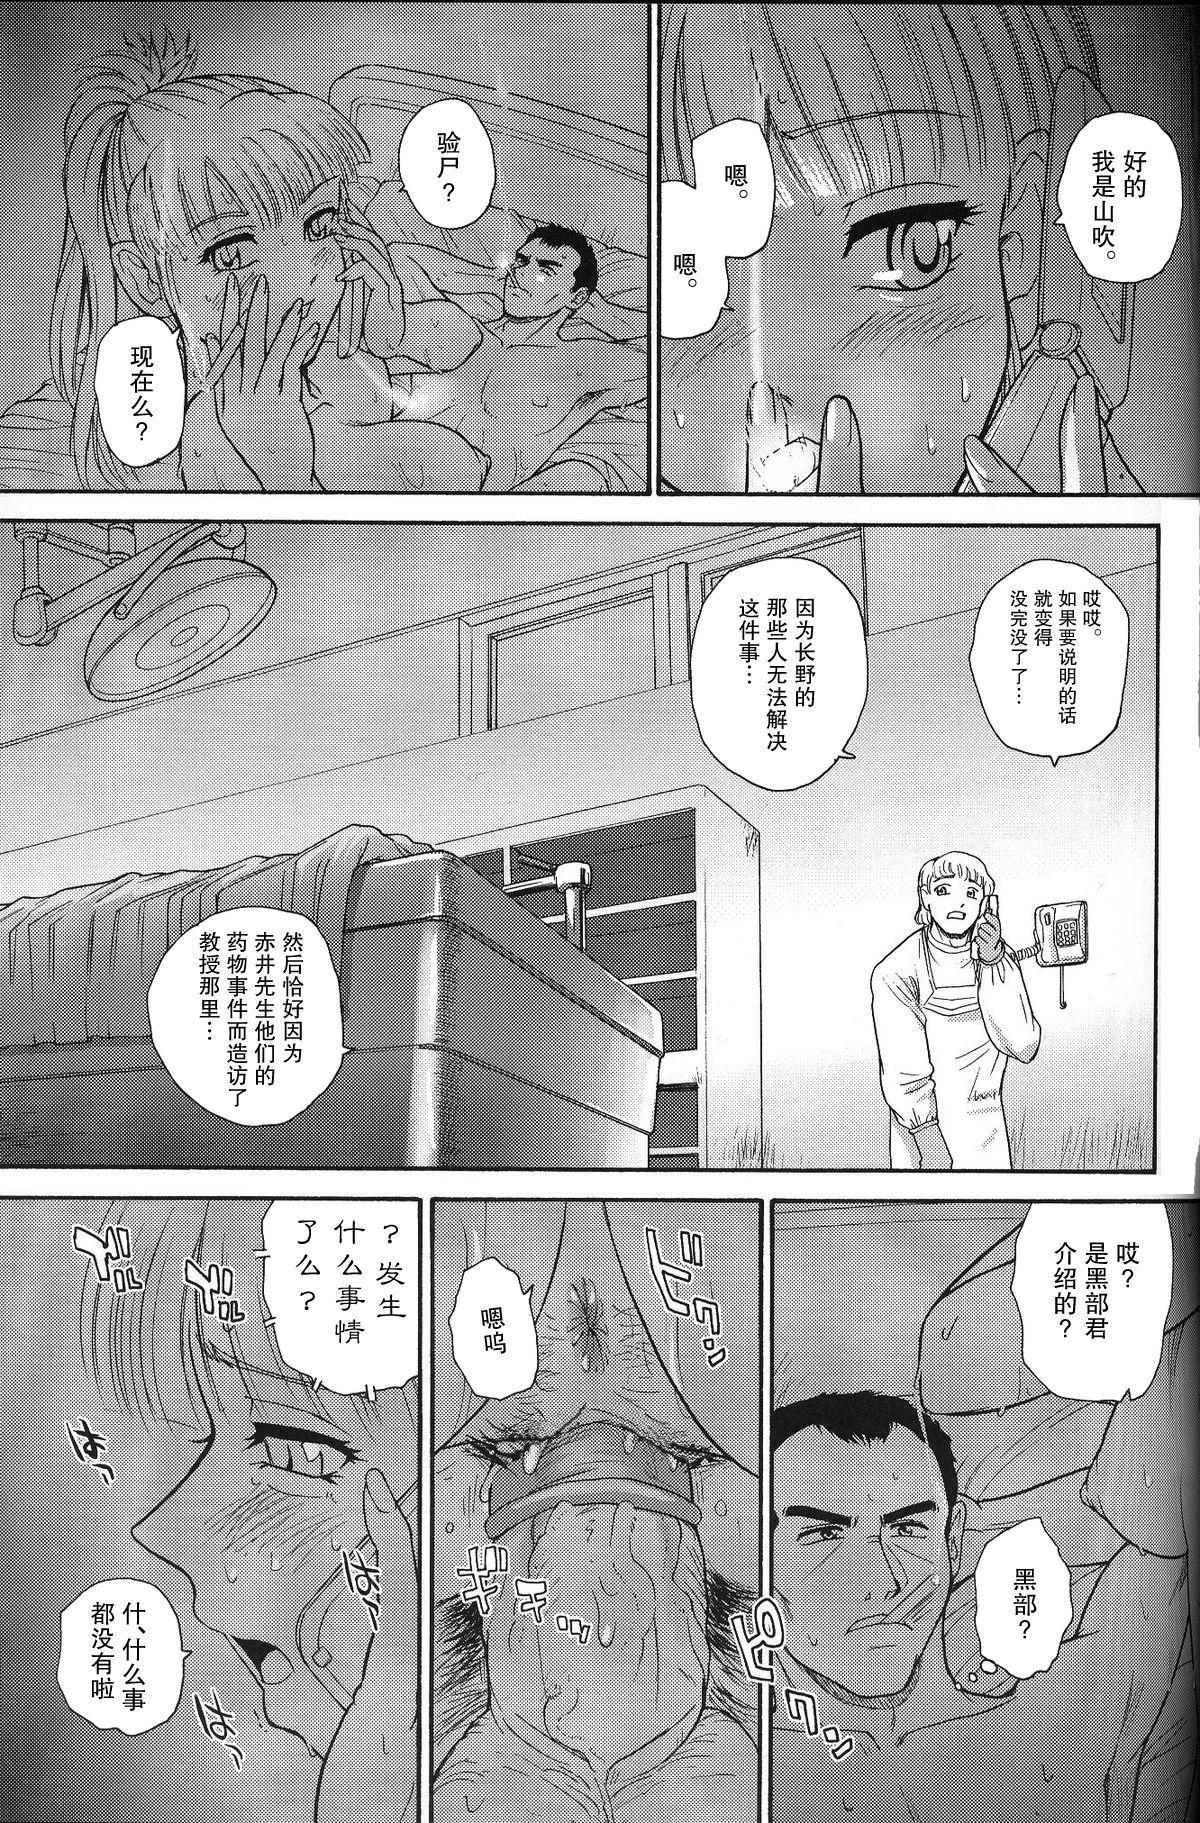 Dulce Report 8 | 达西报告 8 29